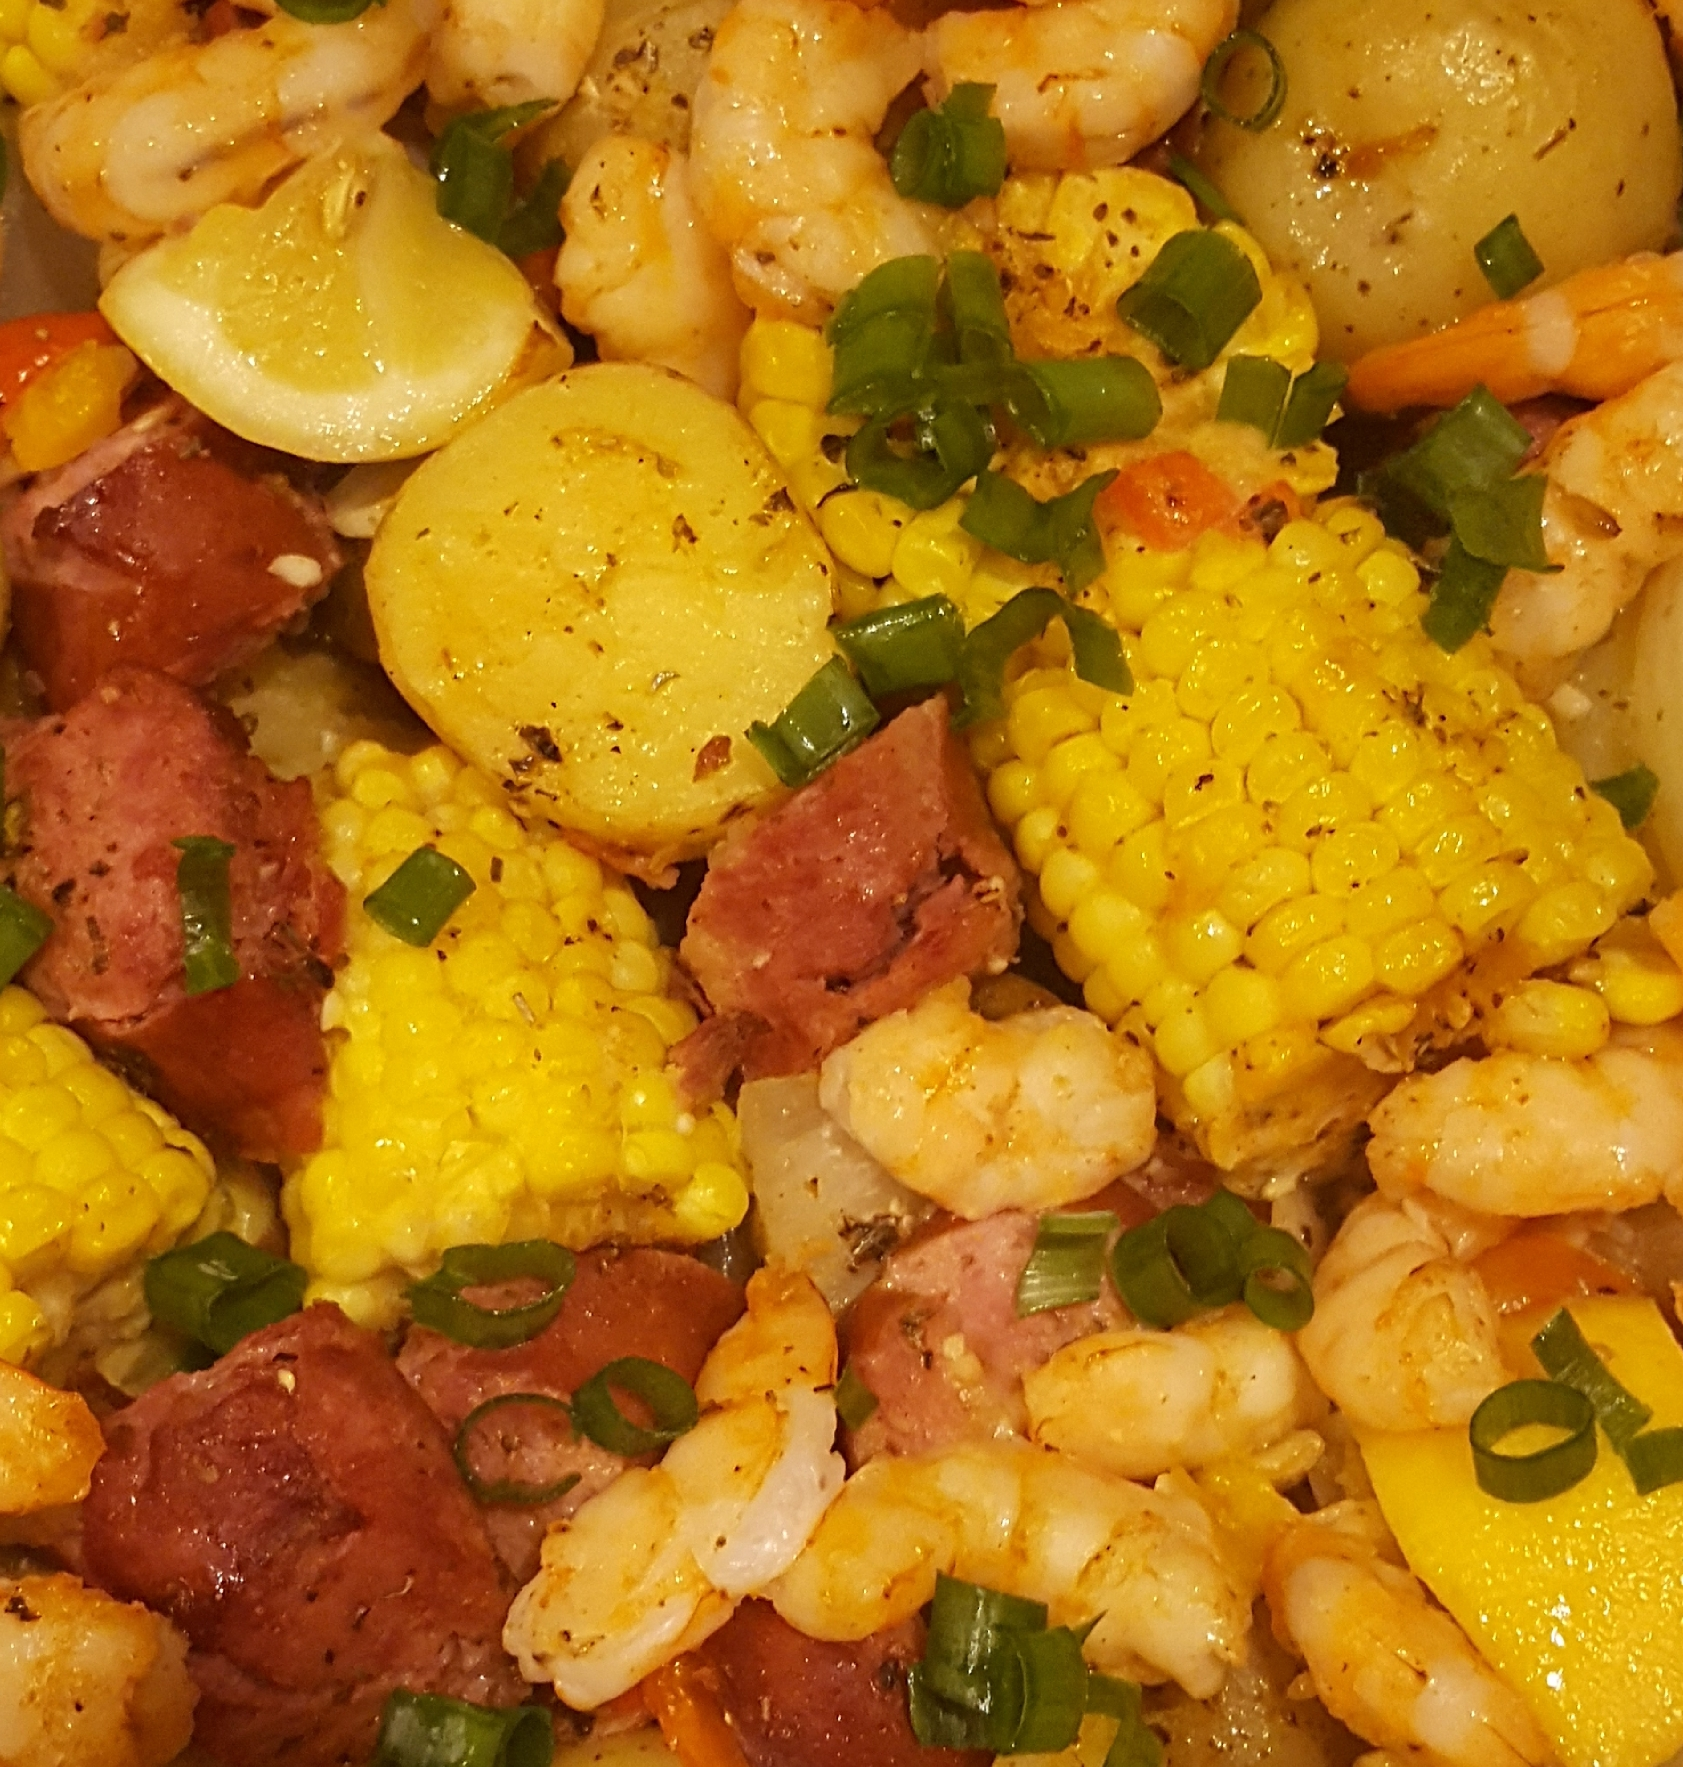 Sheet Pan Shrimp and Sausage Bake